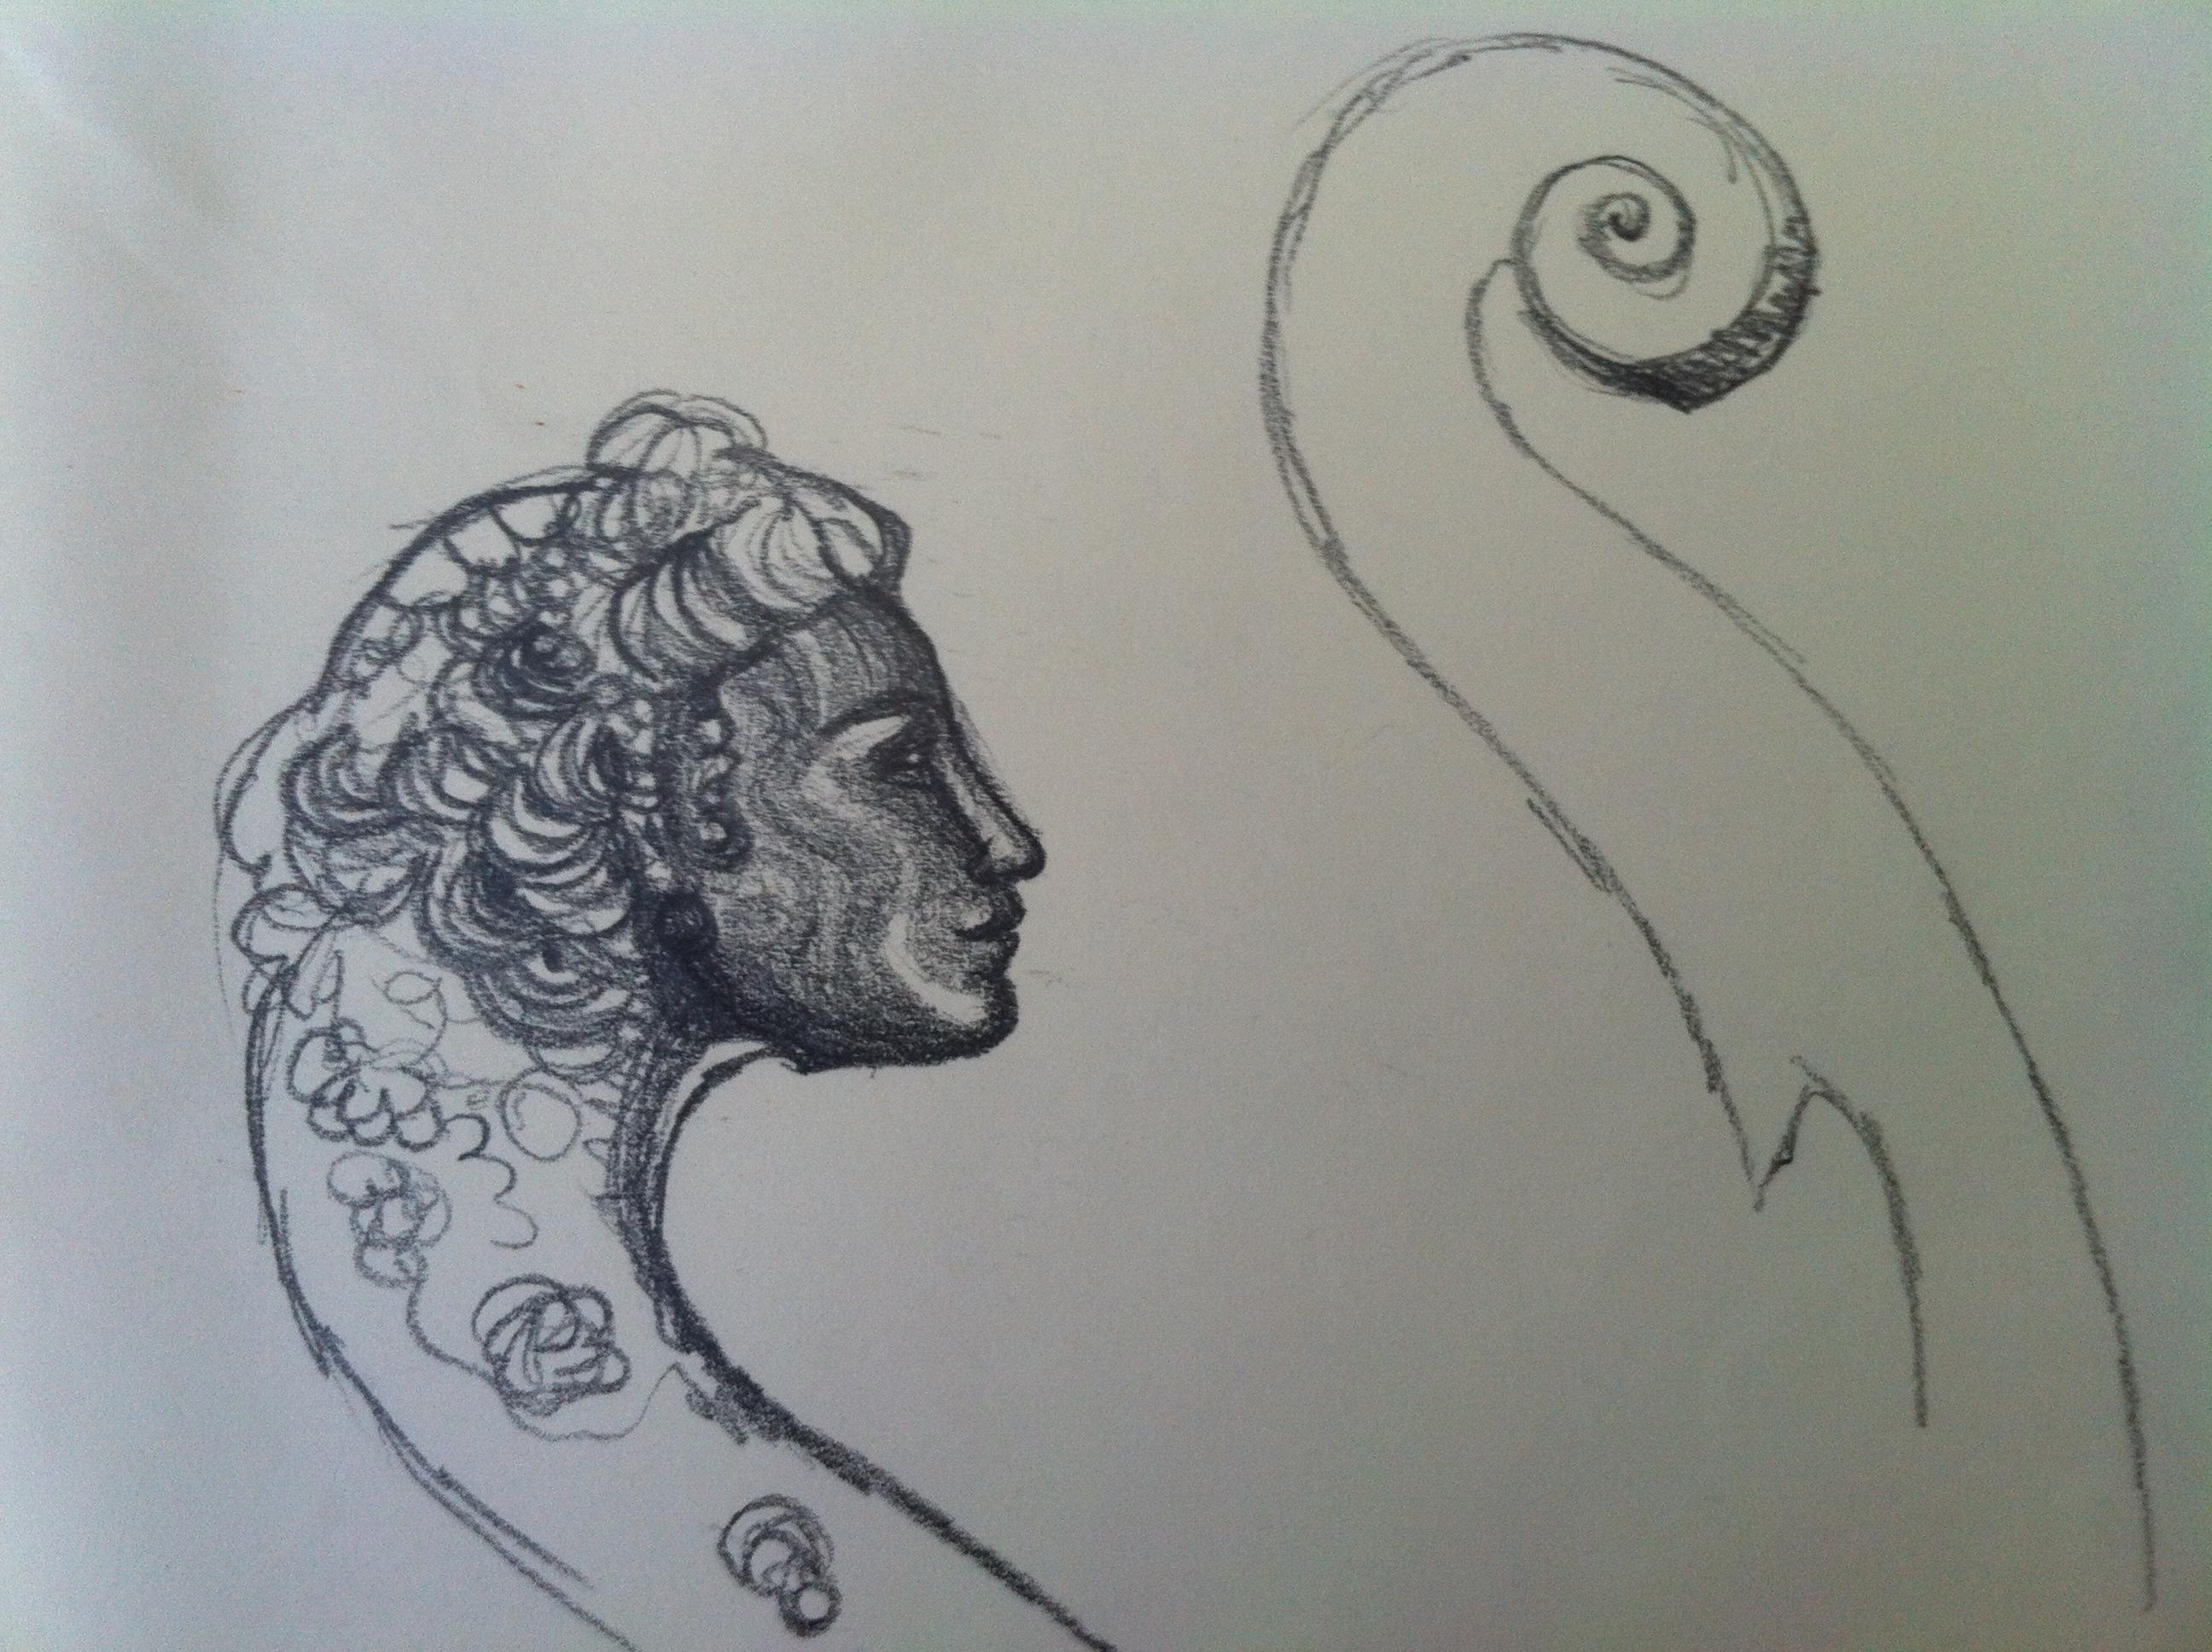 Drawn music Drawing instrument Drawings pencil Ahmad